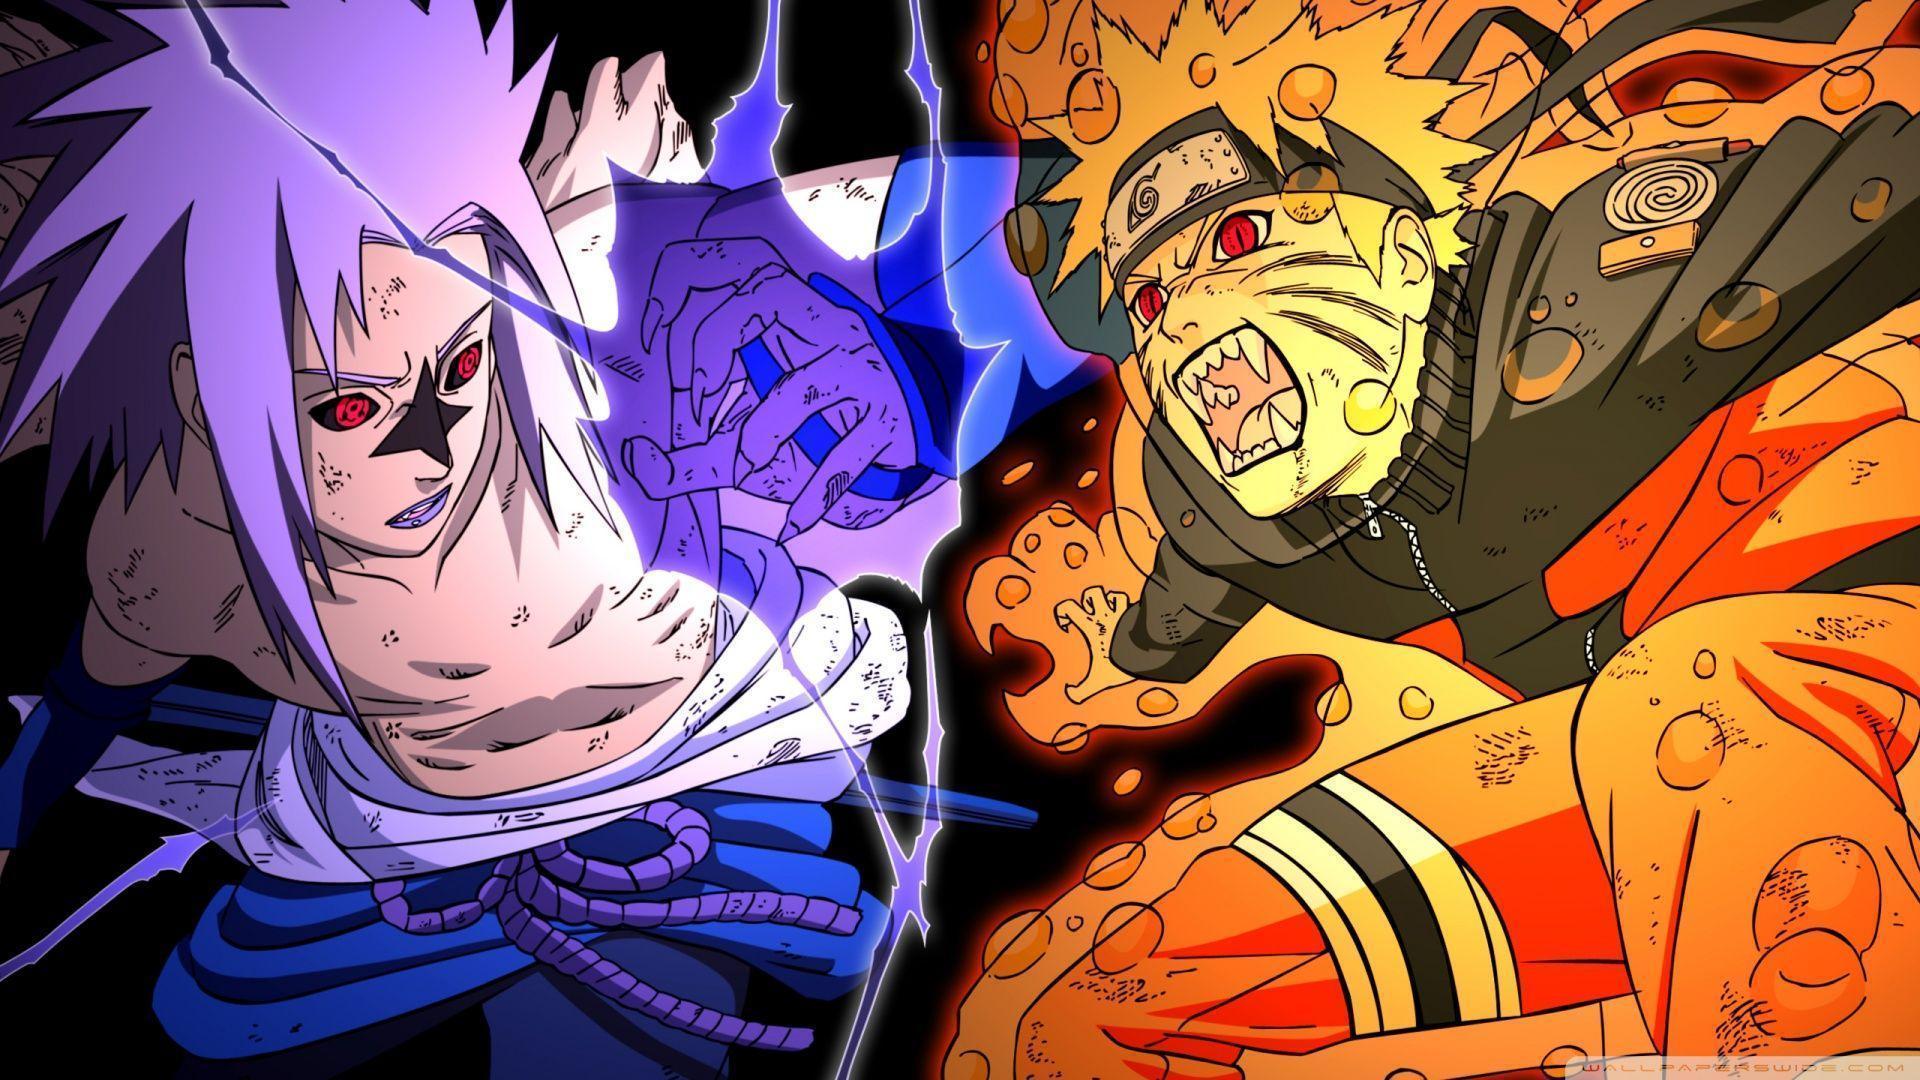 Wallpapers Naruto And Sasuke Wallpaper Cave